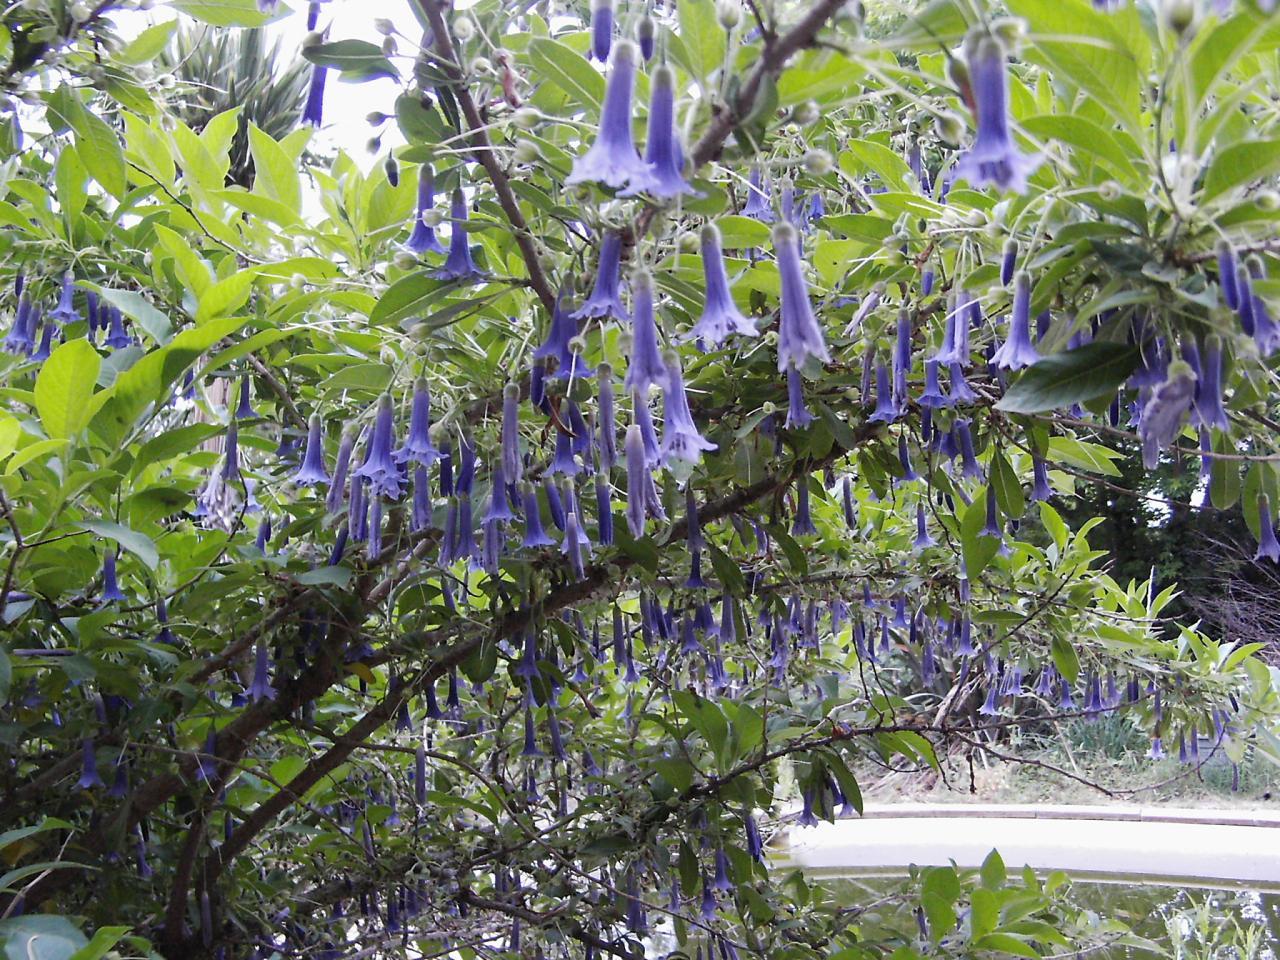 le genre iochroma : rusticité Acnistus-du-jardin-de-saubens-2